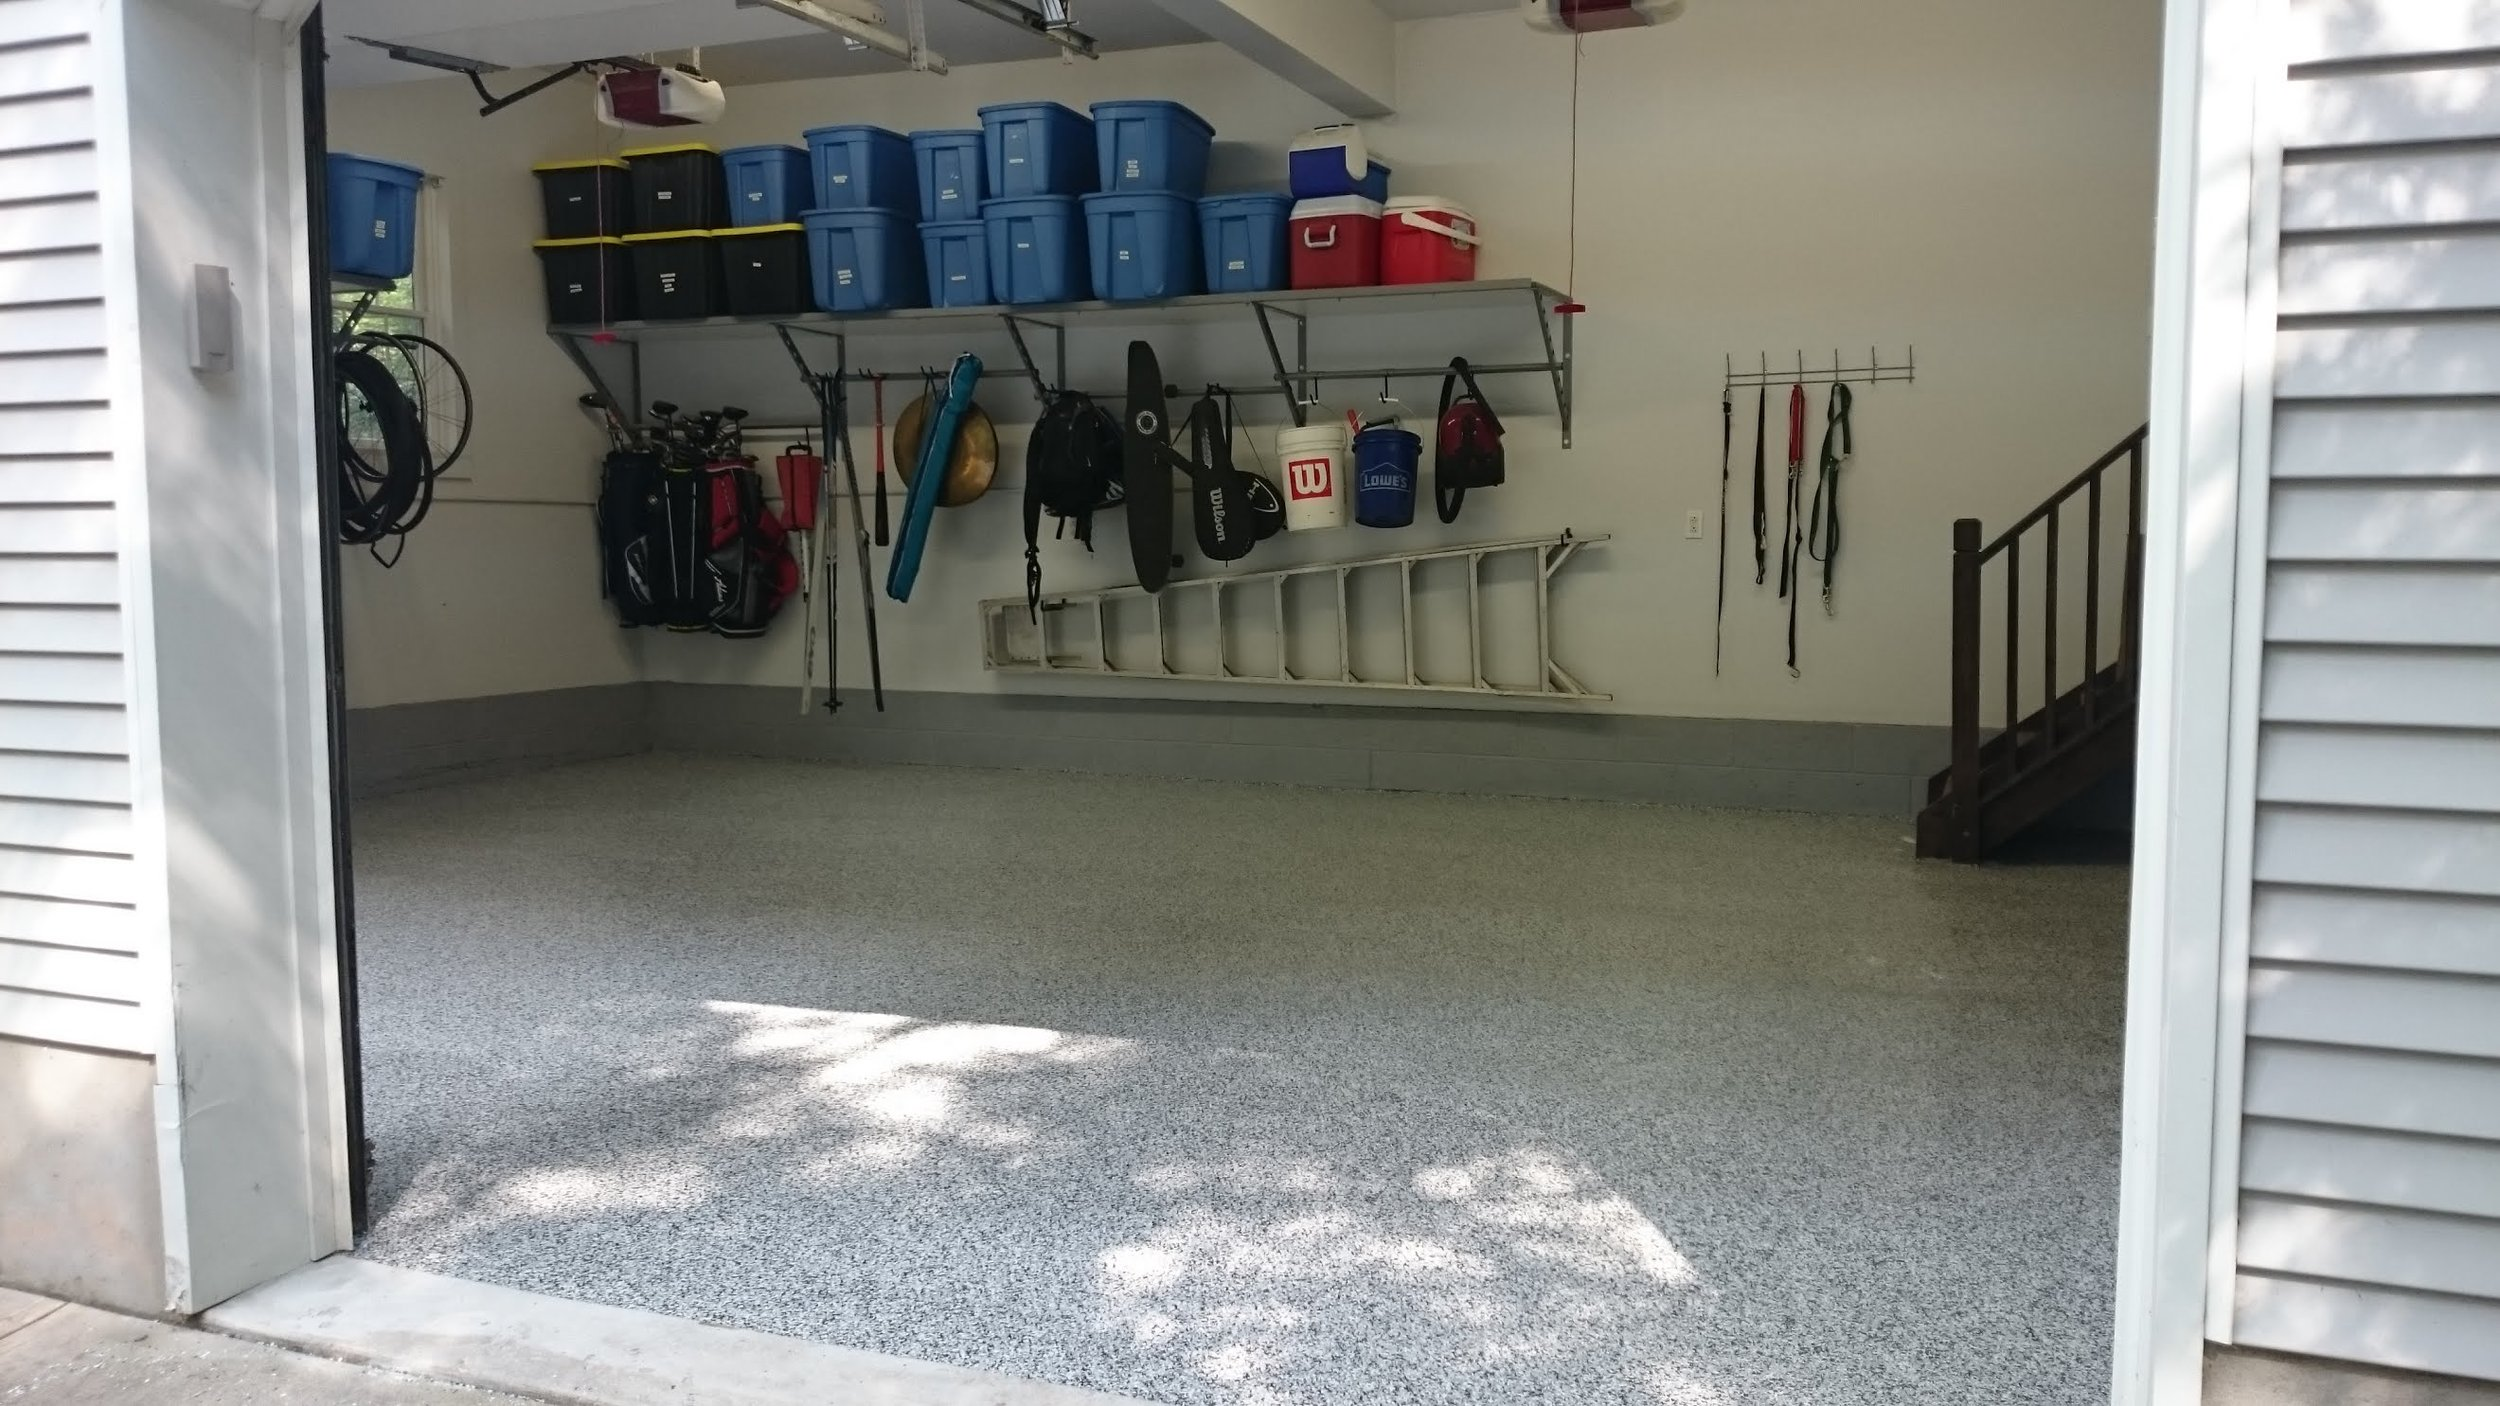 Garage concrete floor with polyurea / POLYASPARTIC coating with garage shelves with under-shelf adjustable rack storage example